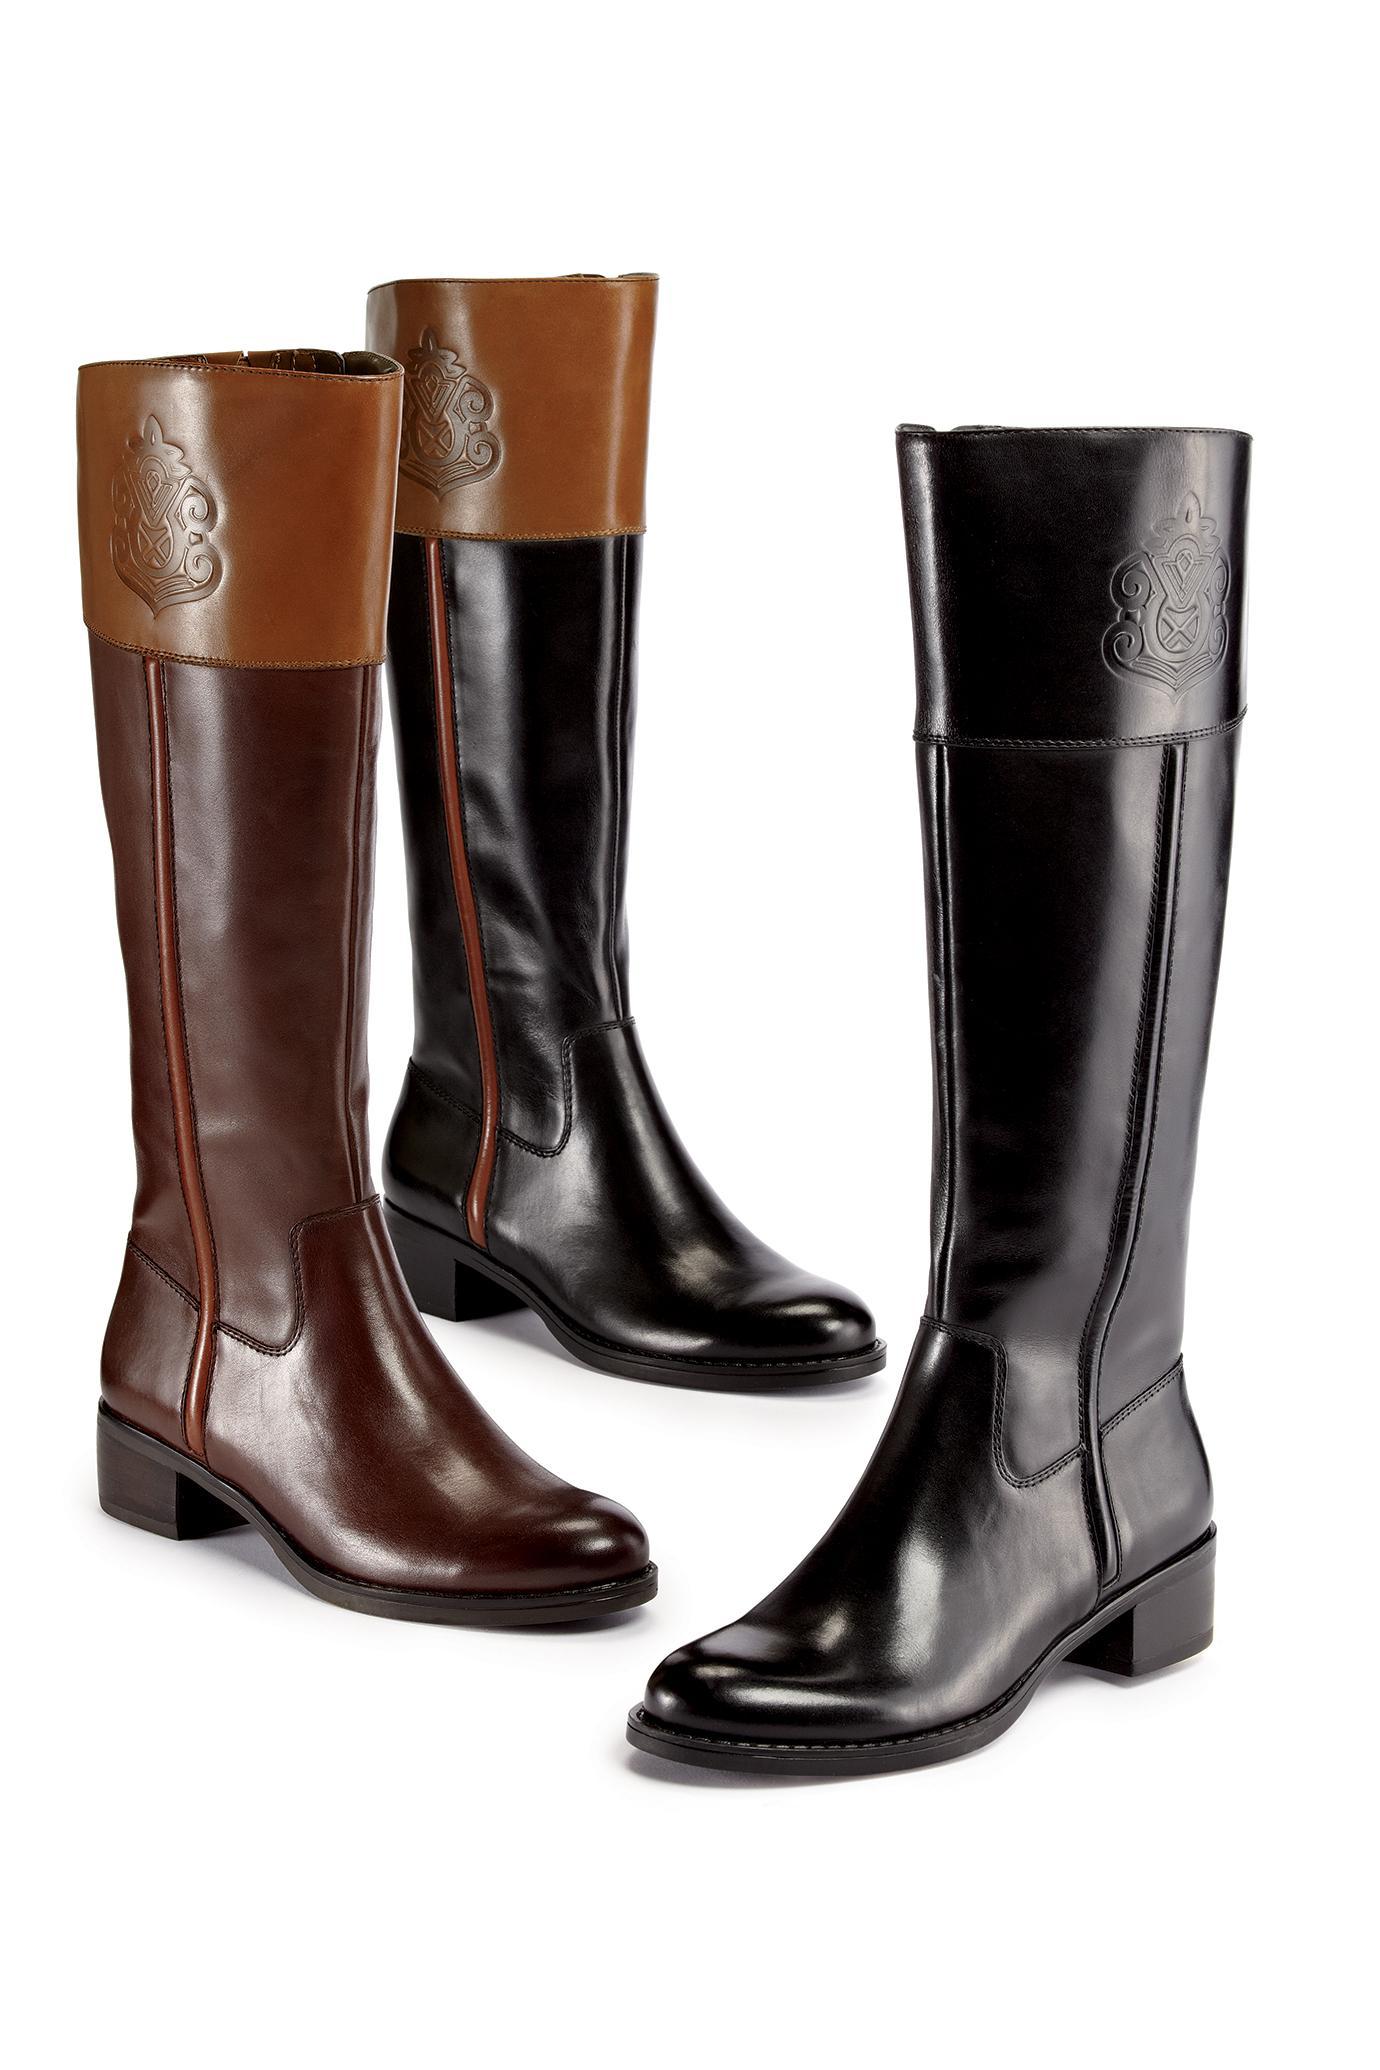 franco sarto boots embossed leather riding boots by franco sarto | chadwicks of boston FIIFWYA